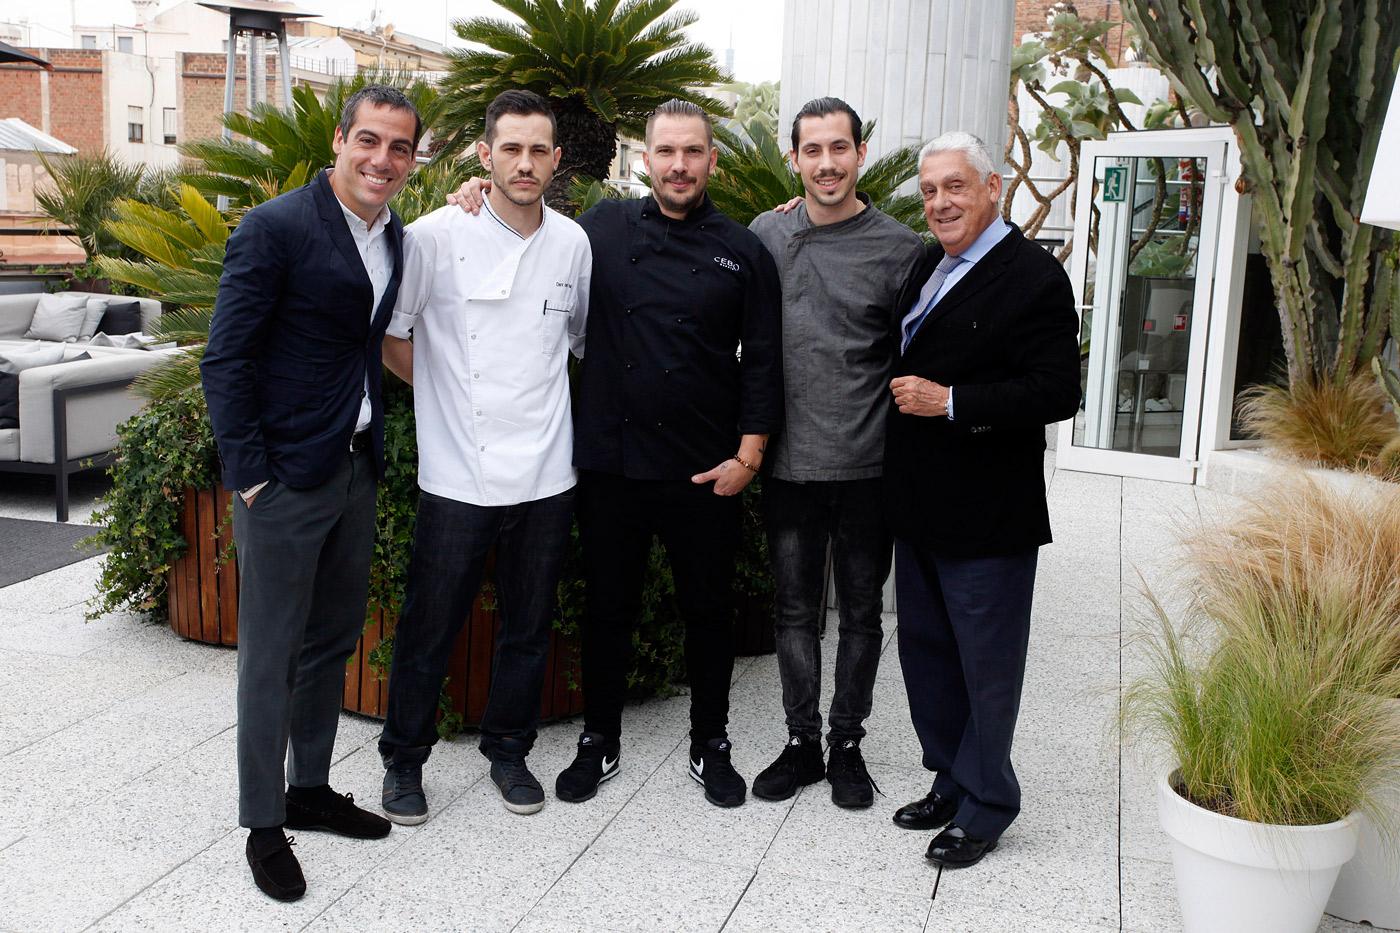 Joaquim Clos, Jordi Clos, Daniel del Val, Aurelio Morales y Daniel Hernandez